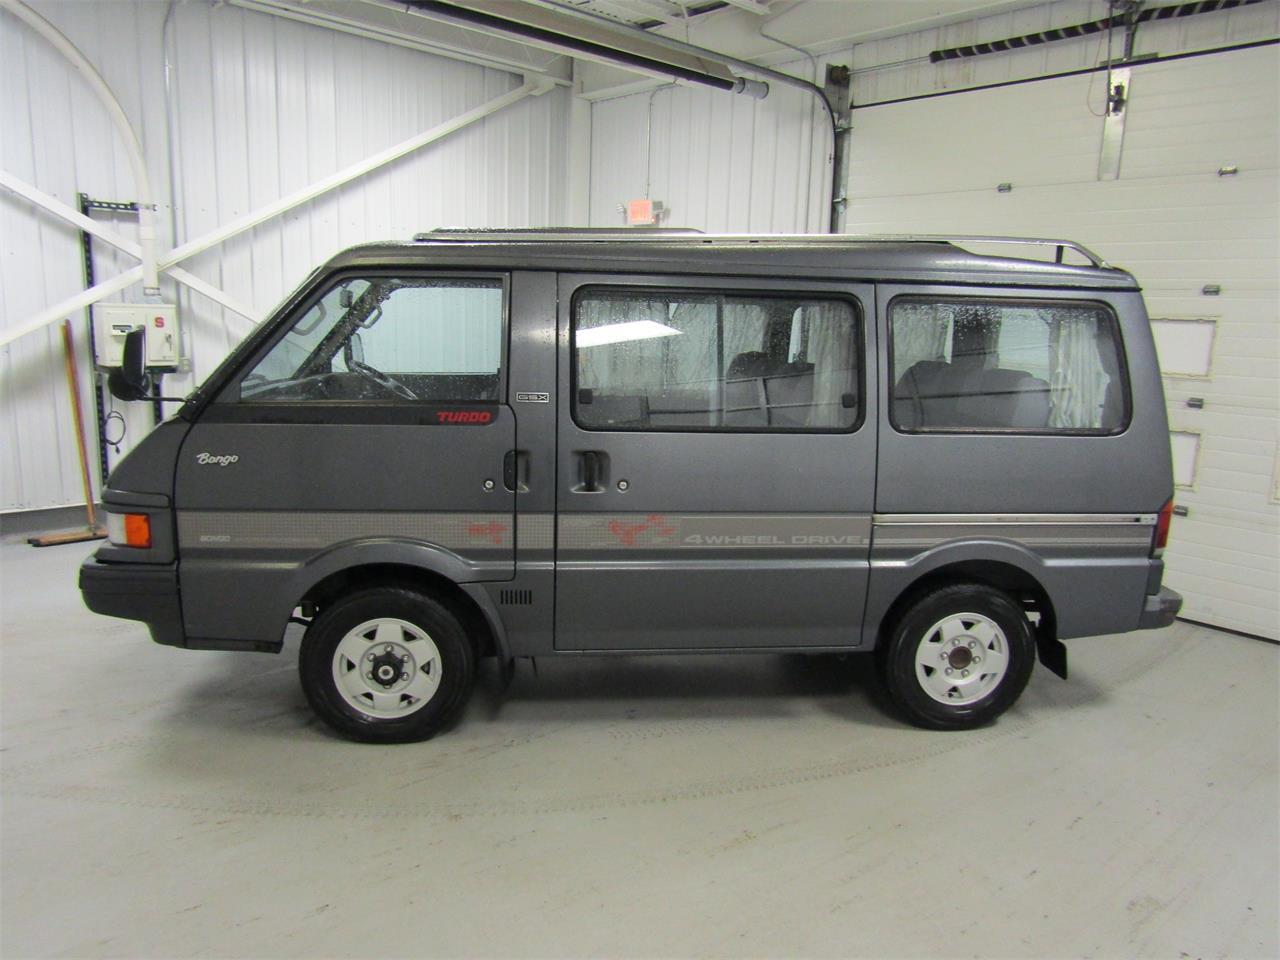 1991 Mazda Bongo Wagon for Sale | ClassicCars.com | CC-1066536